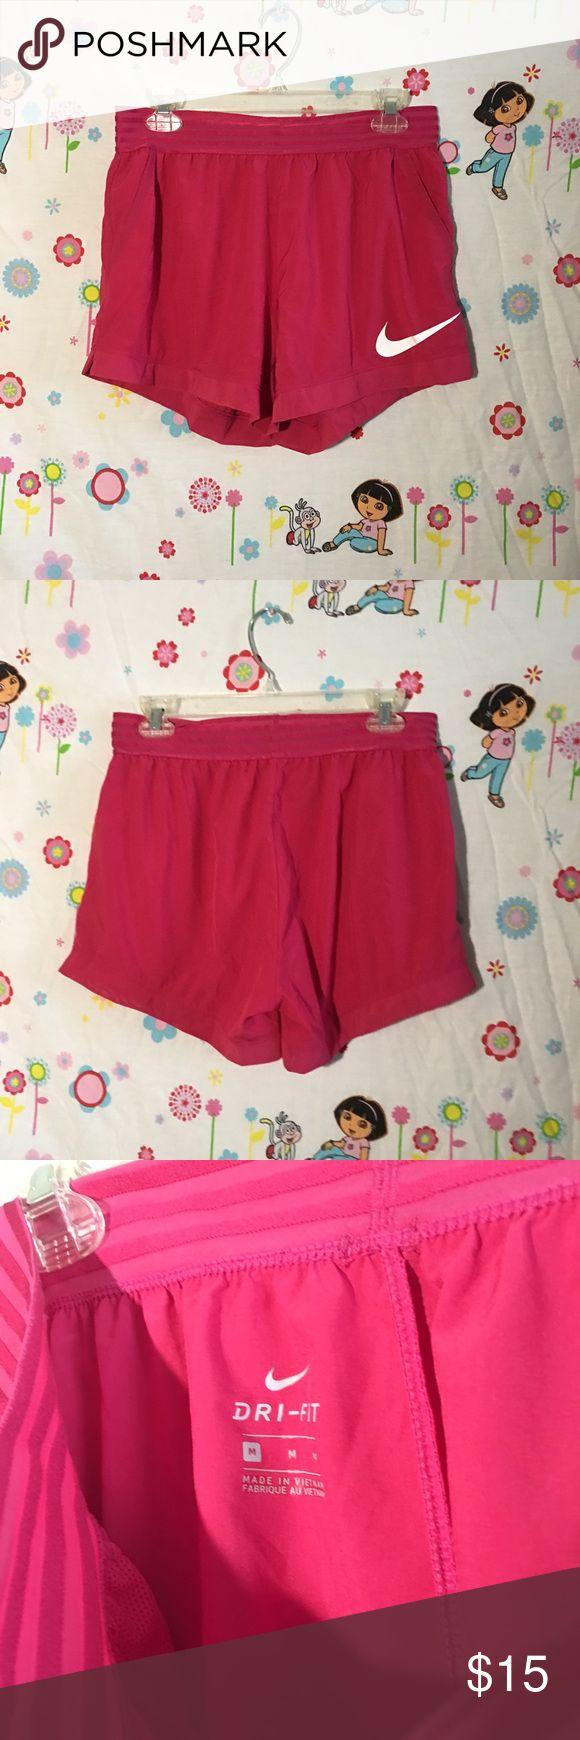 Dri-Fit Nike-Shorts für Damen Super bequeme, pinke Dri-Fit Nike-Shorts, die …   – My Posh Picks